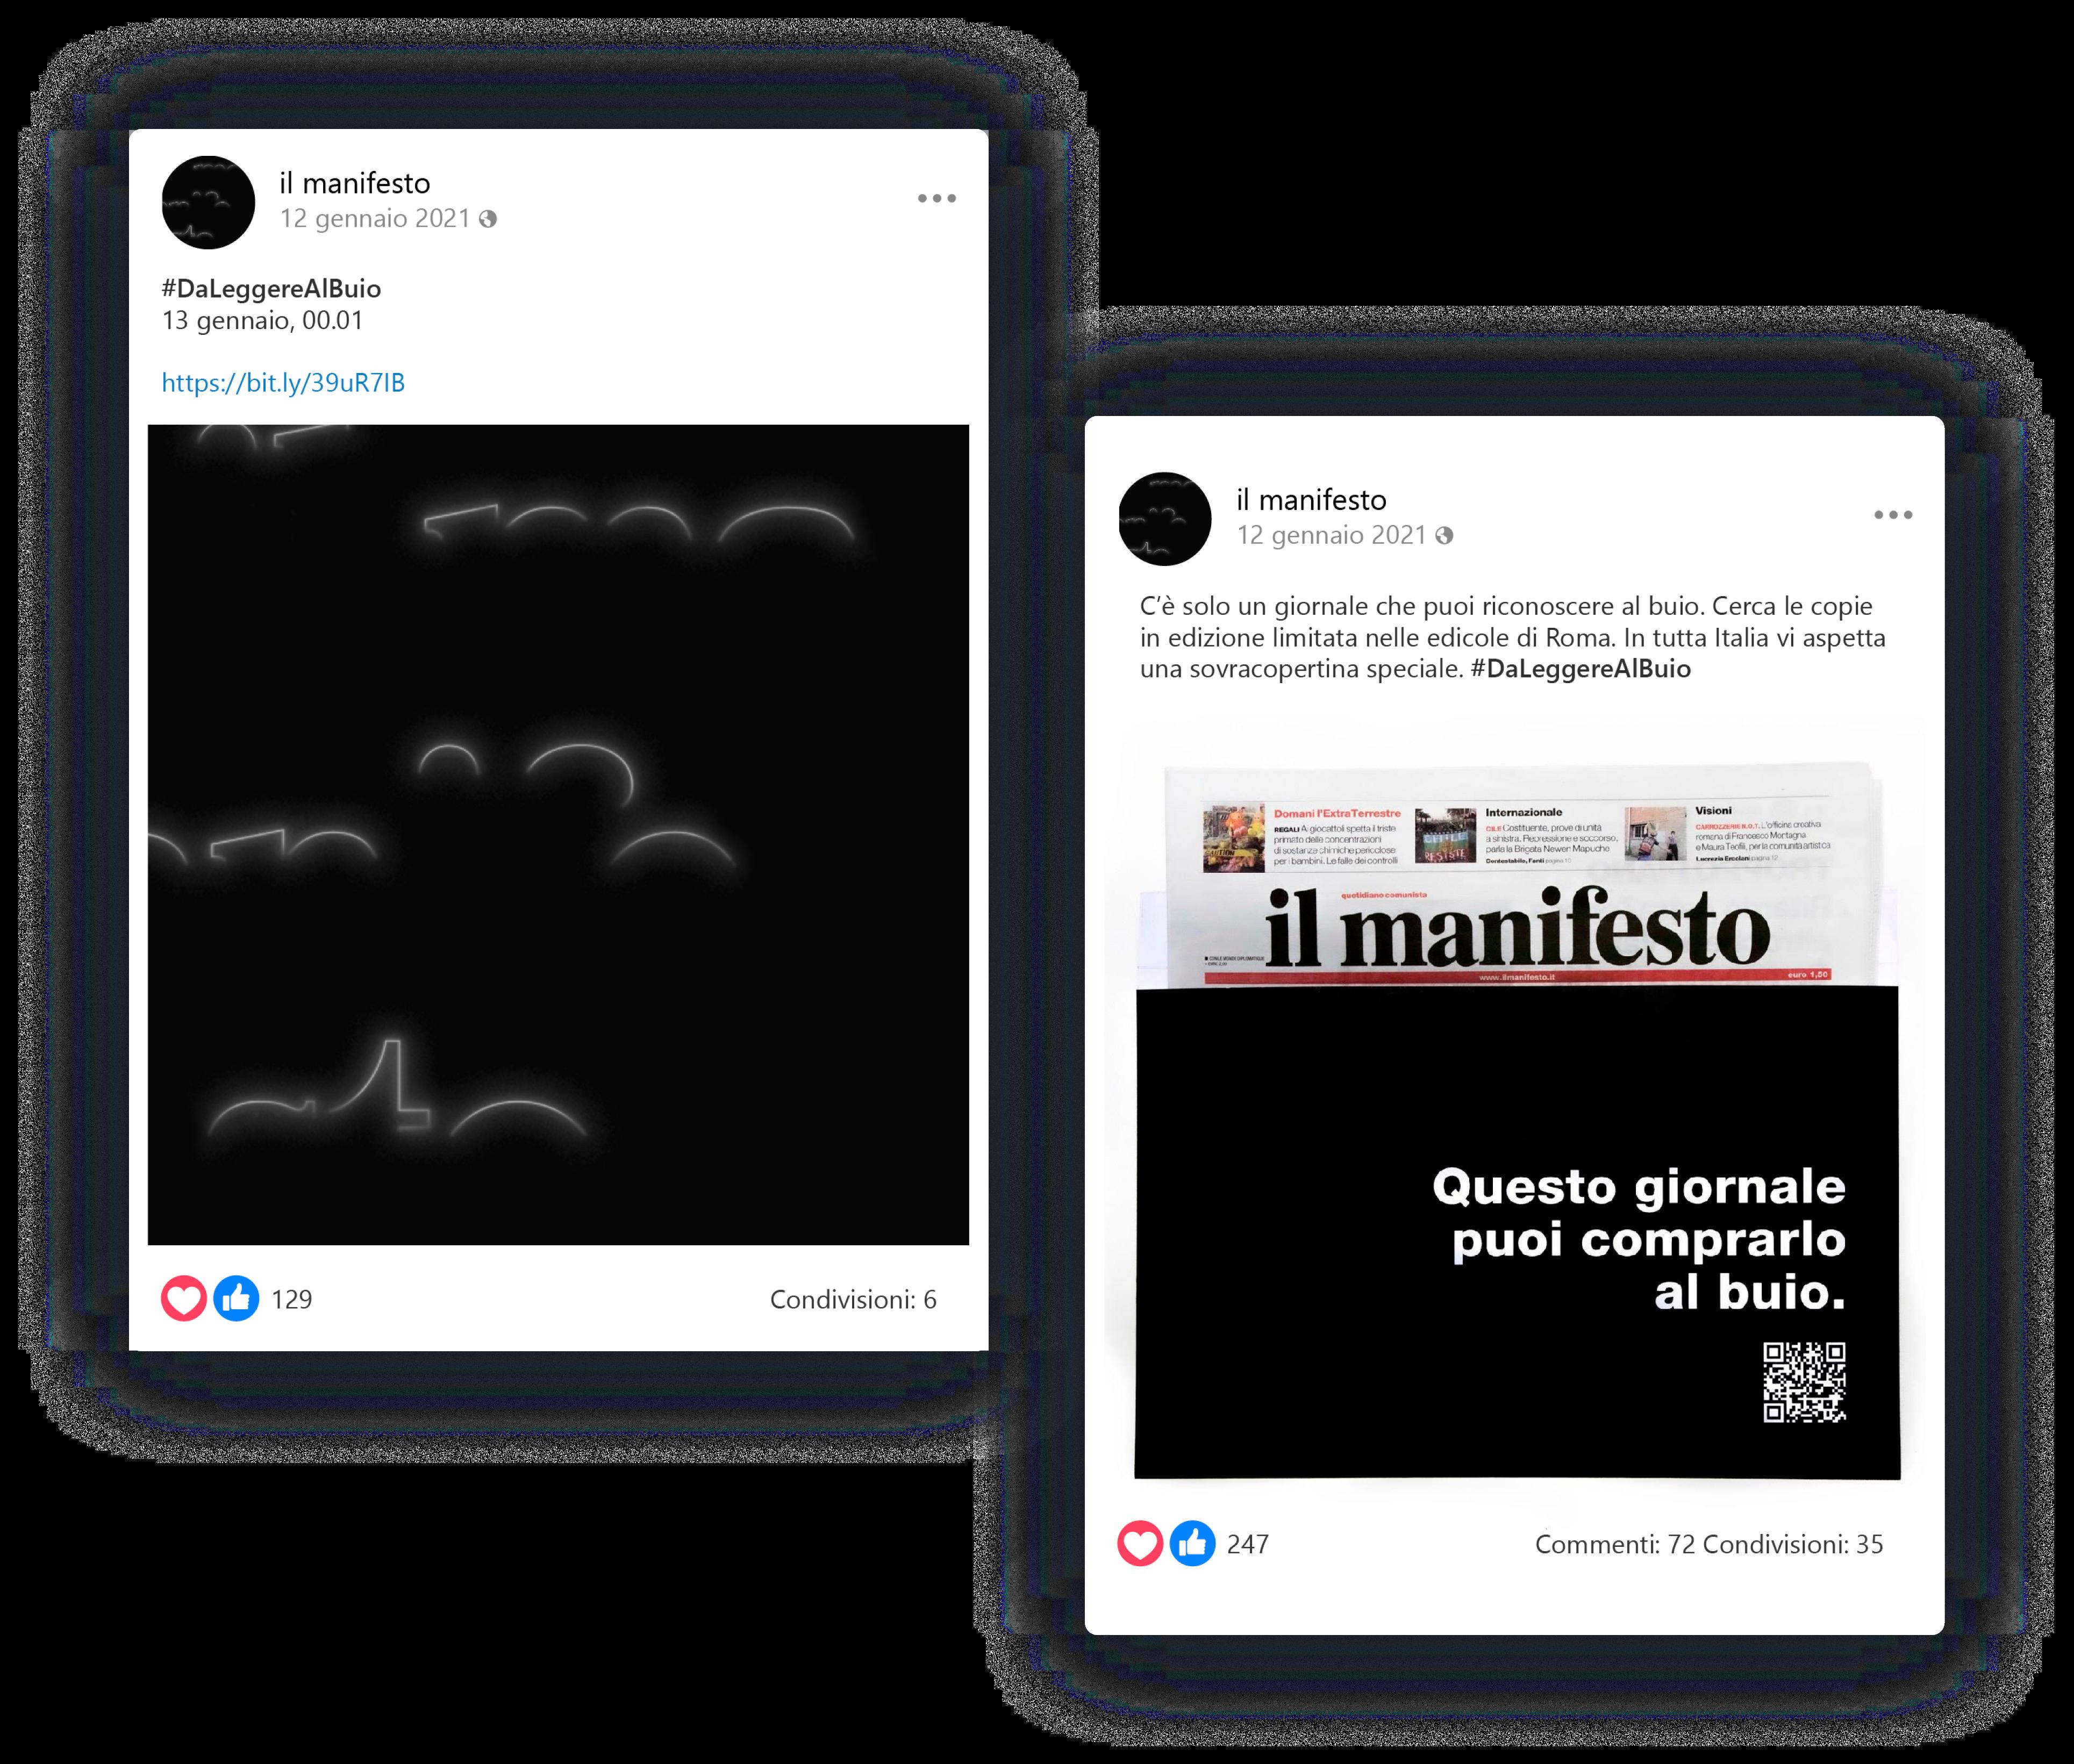 Lancio_posts